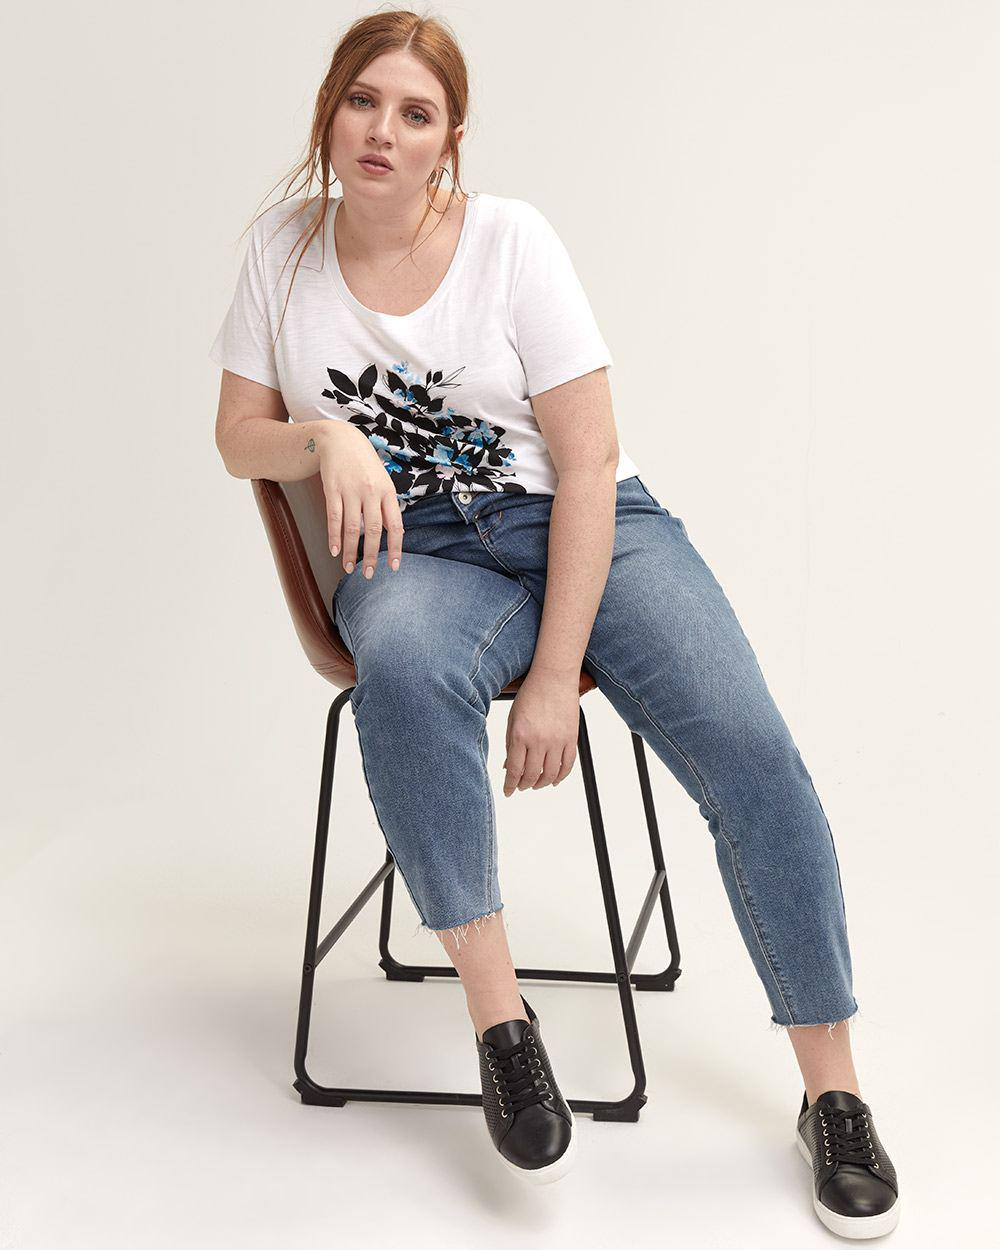 acb2c027e07fe Lyst - Addition Elle Graphic Scoop-neck Boyfriend T-shirt - L l in White